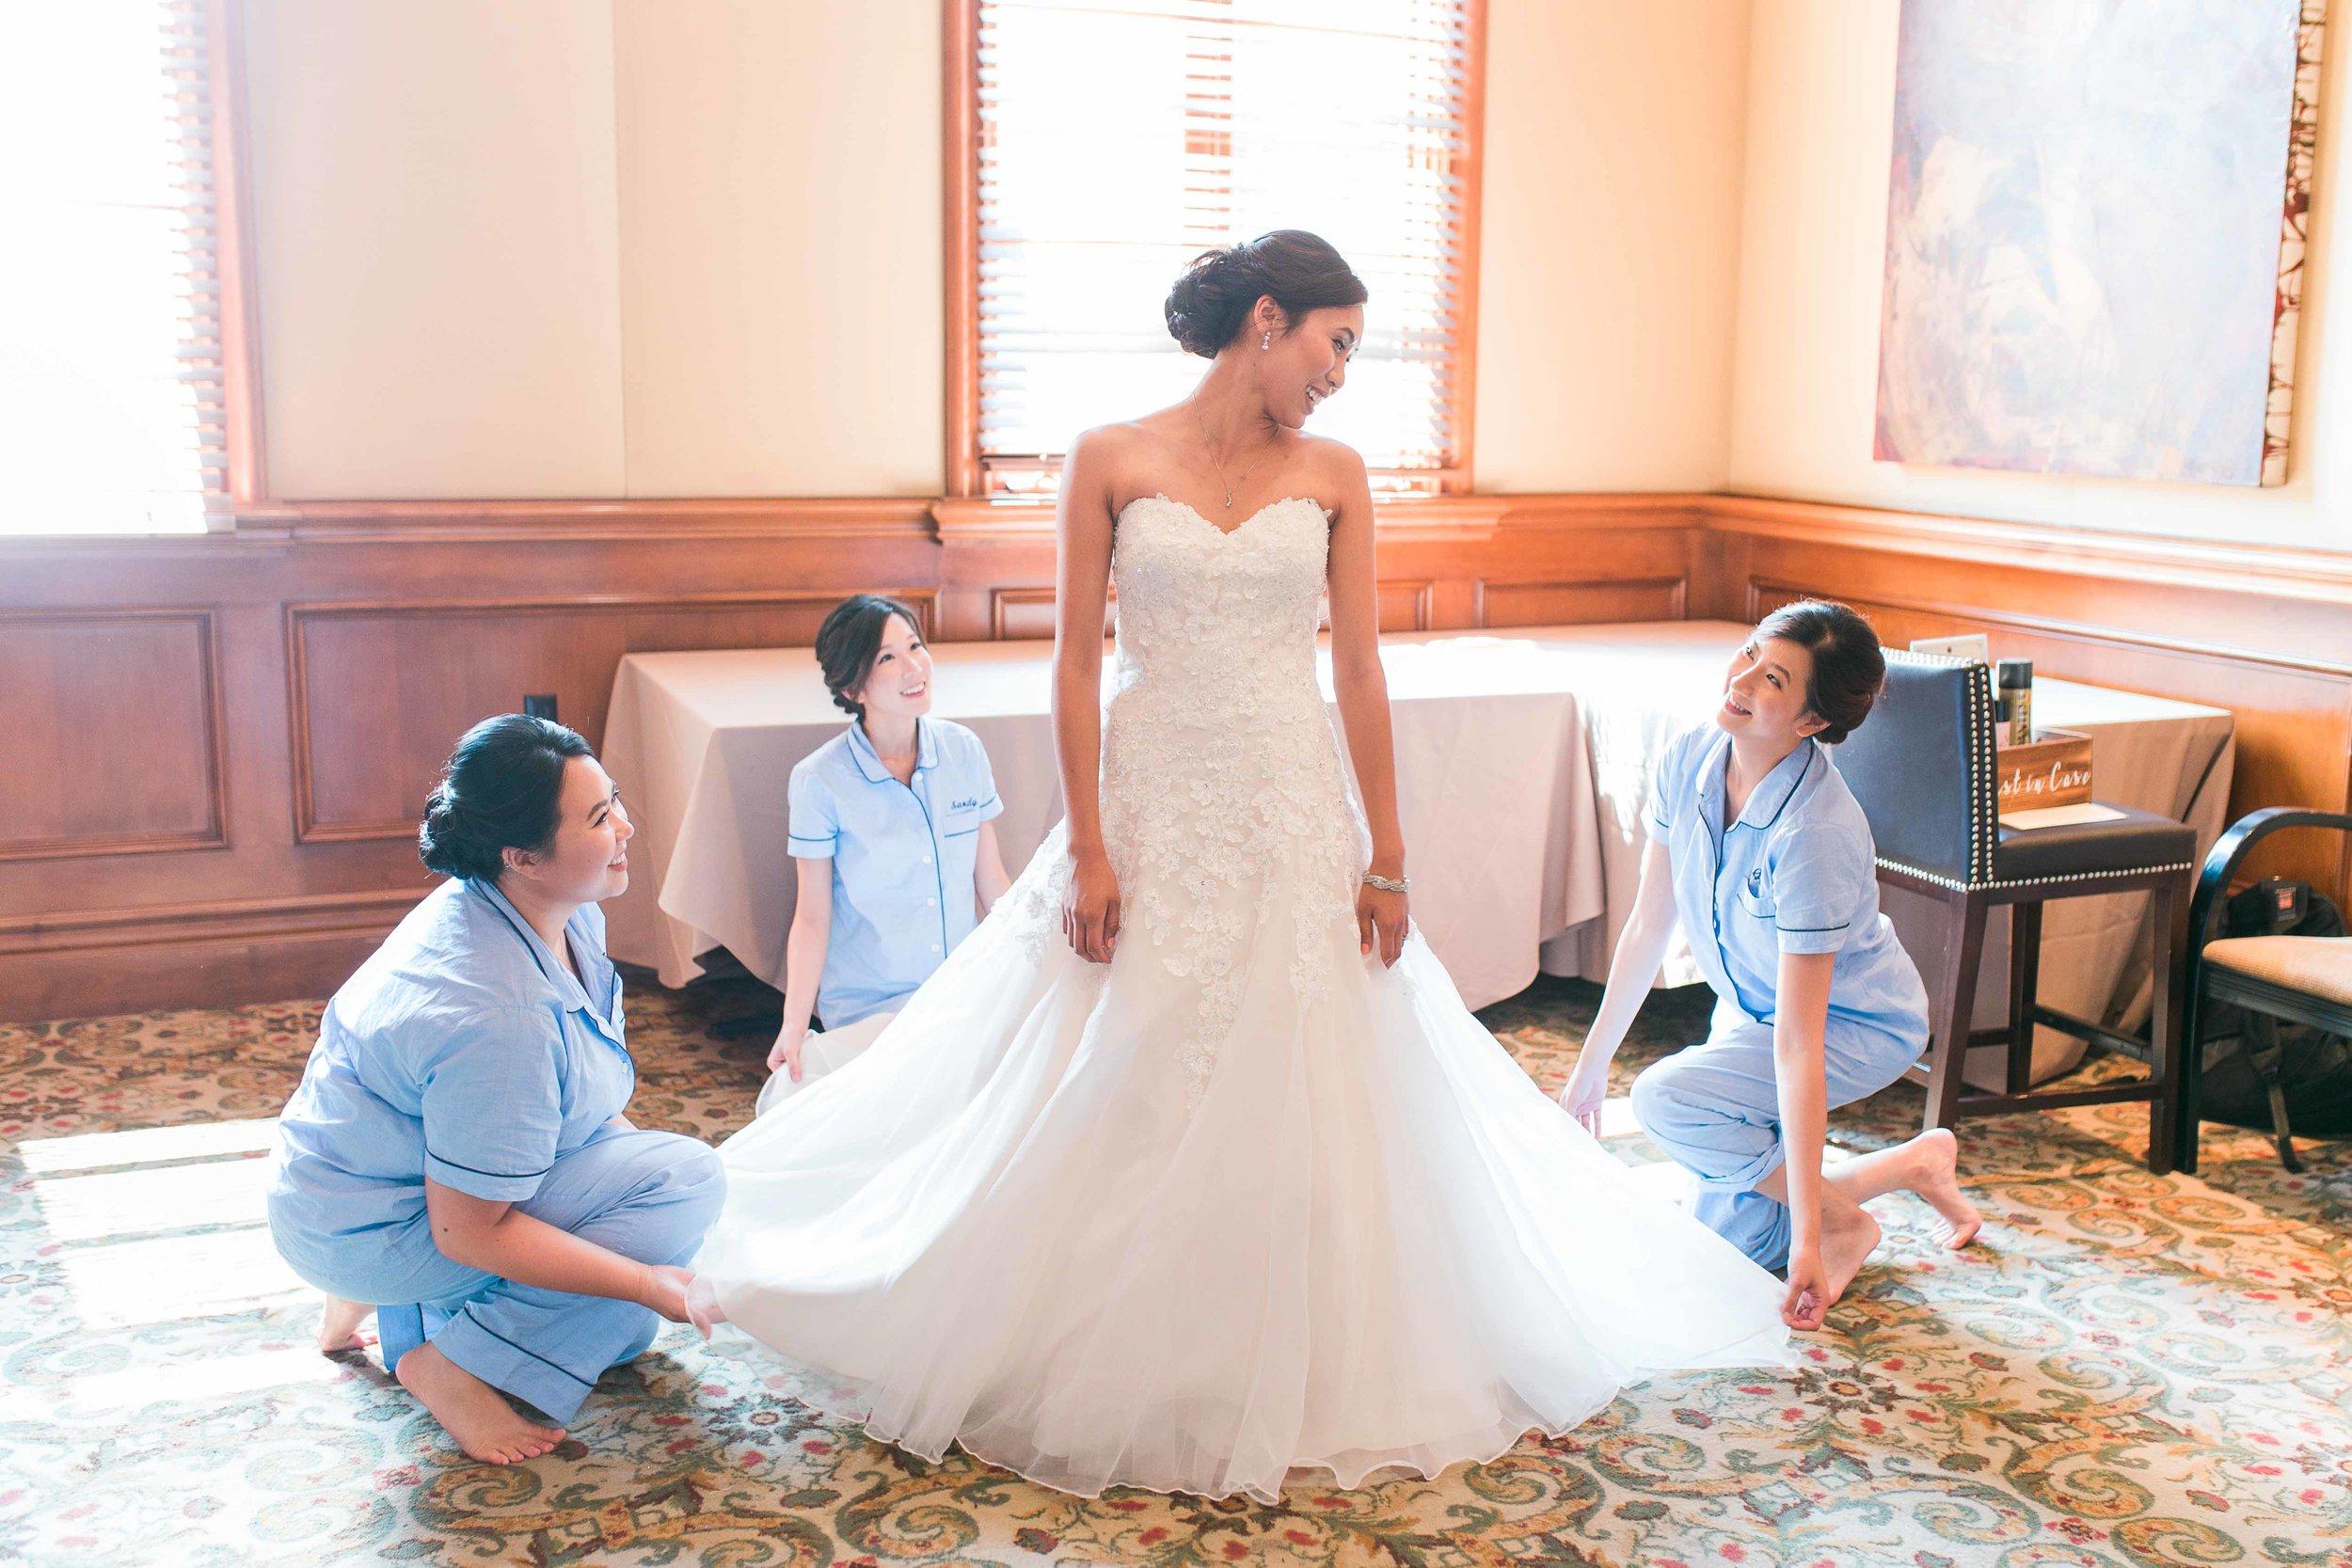 Ruby Hill Wedding Photos by JBJ Pictures - San Francisco Wedding Photographer - Pleasanton Wedding Venue (10).jpg